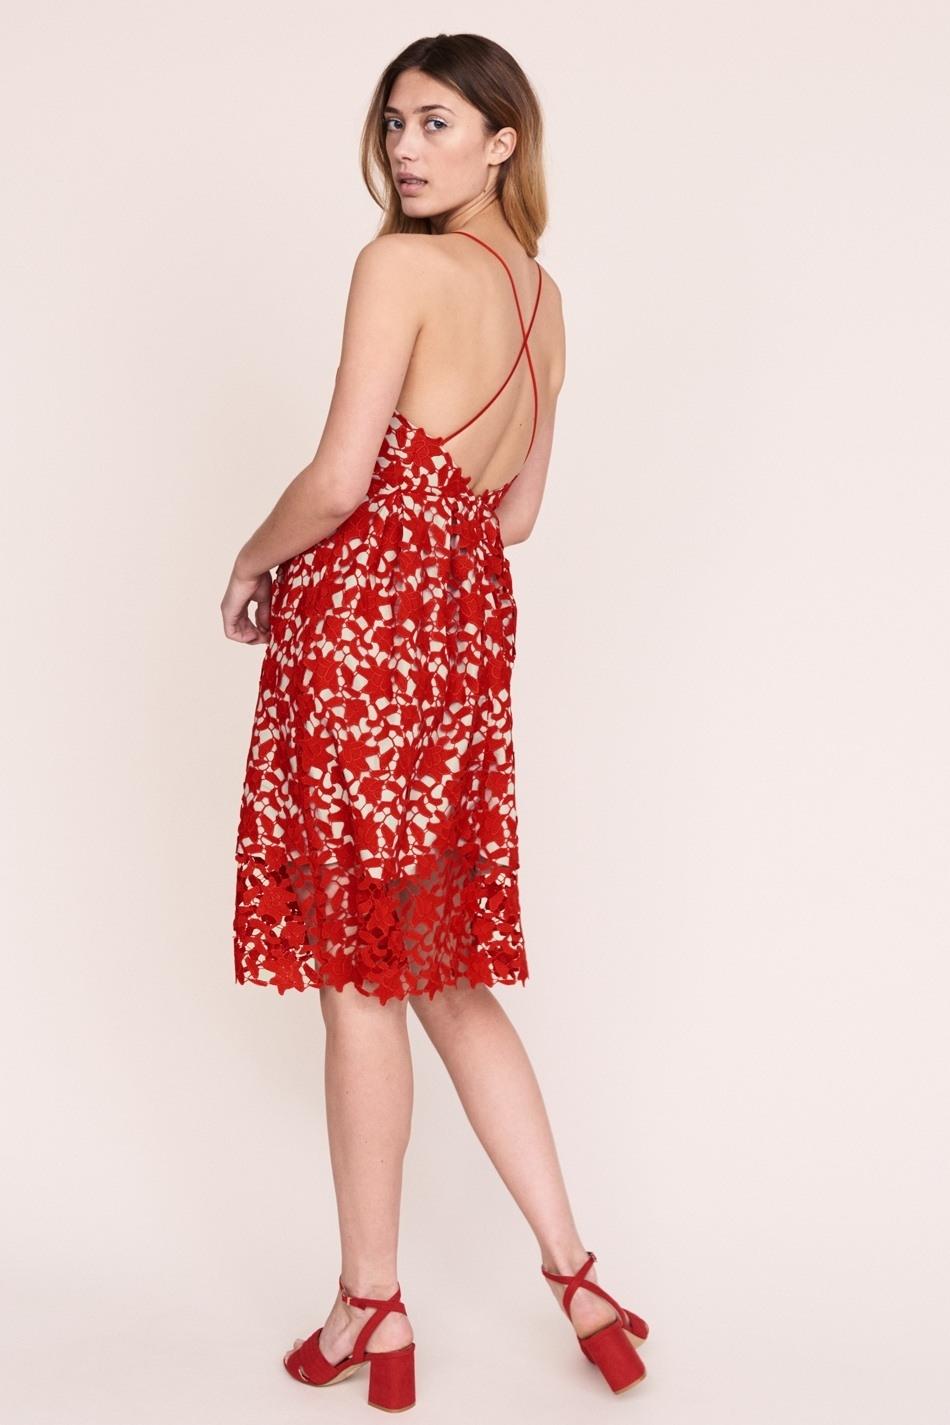 15 Luxus Spitzenkleid Rot Galerie Spektakulär Spitzenkleid Rot Stylish